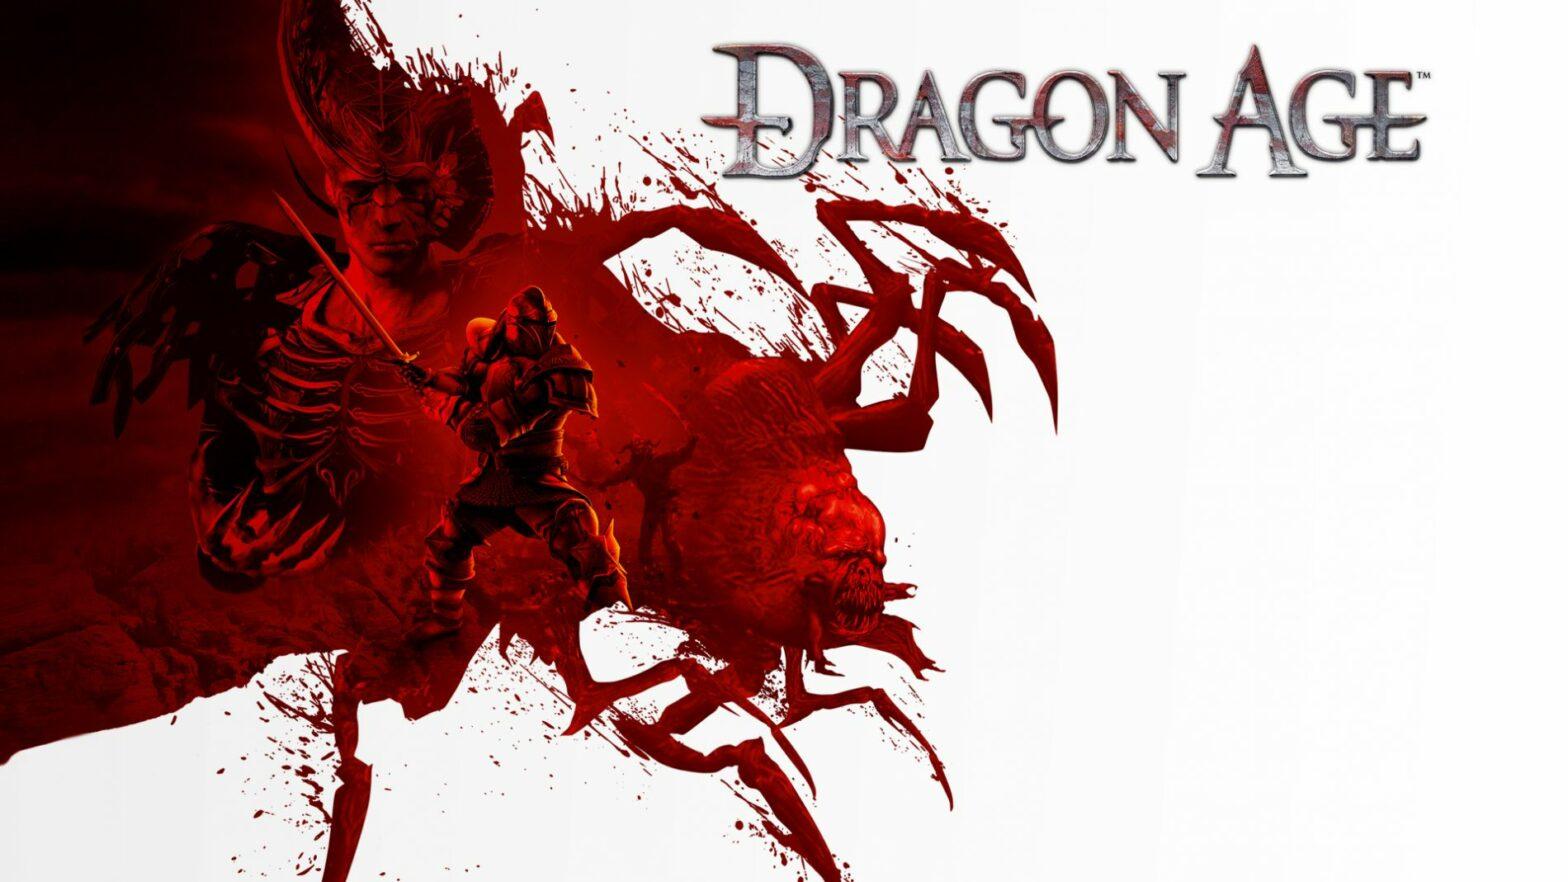 Dragon Age-Autor arbeitet an unangekündigtem BioWare-Projekt